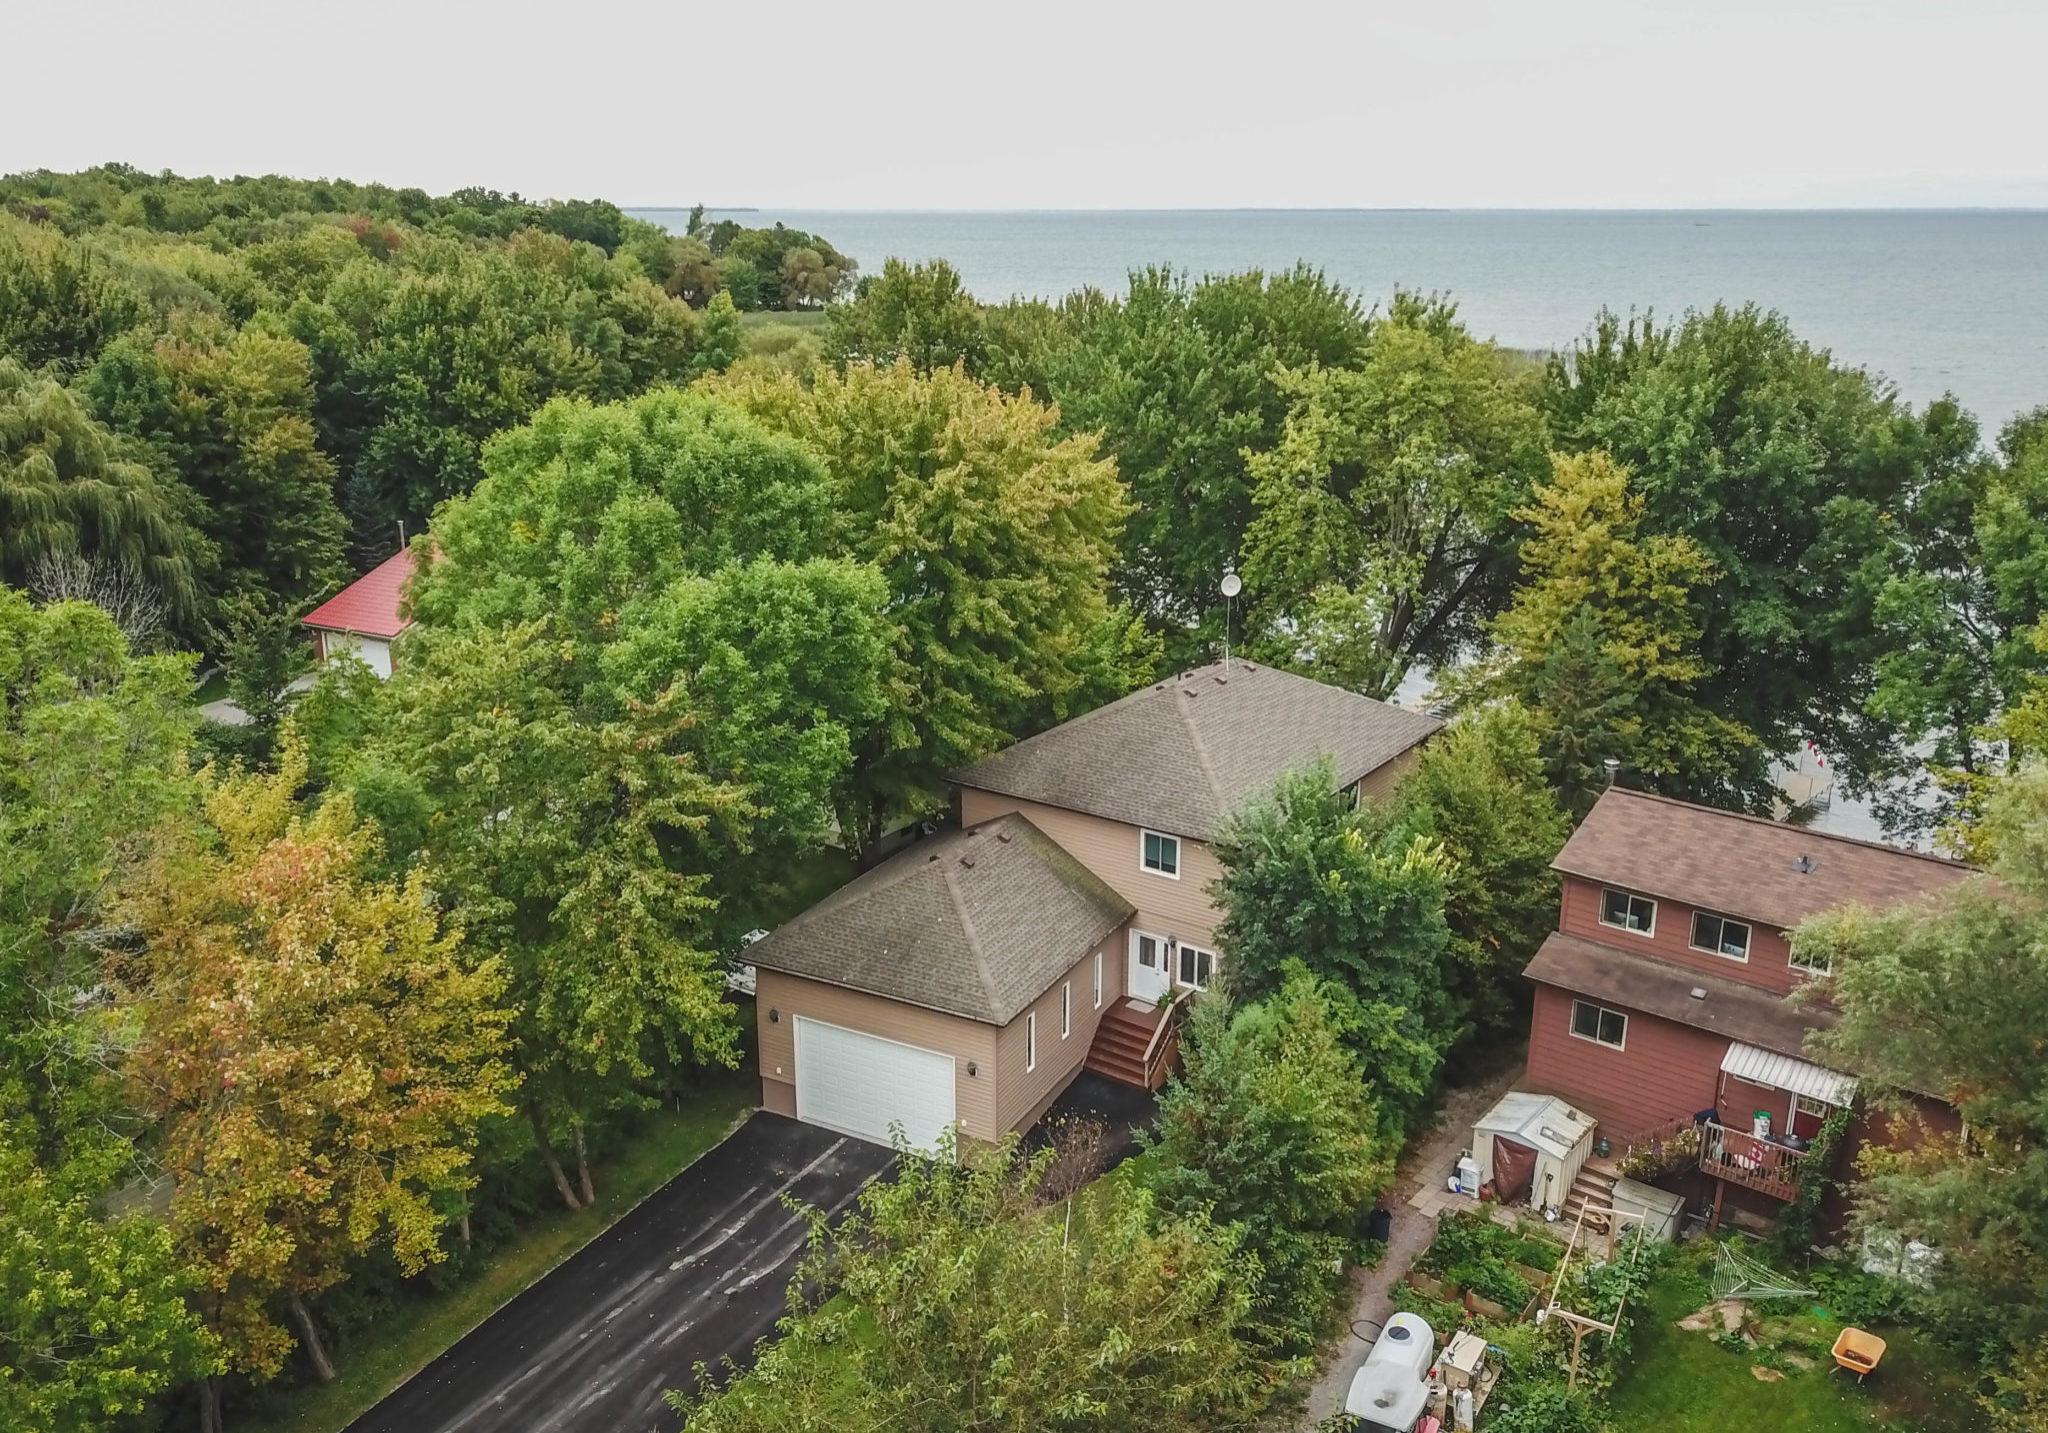 Joyland Beach cottage aerial view